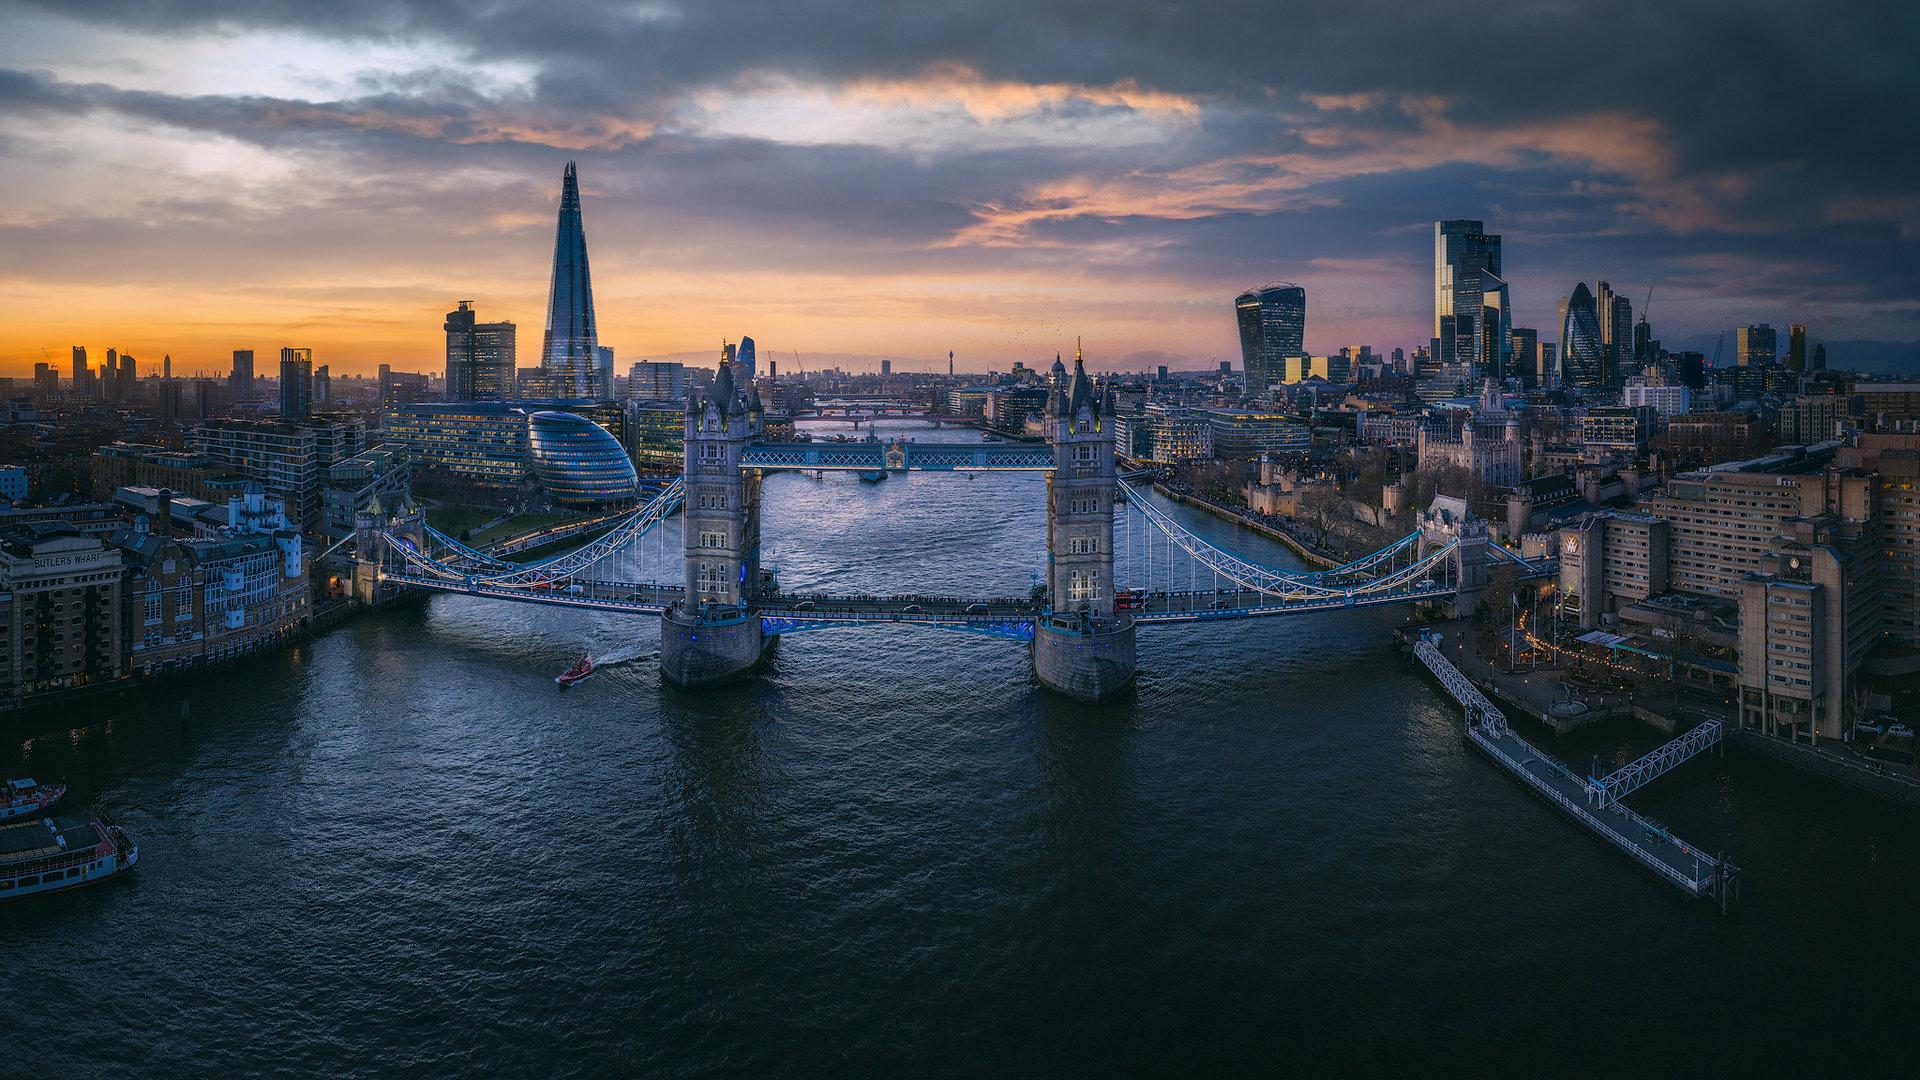 Лондон | Author Remo Daut - wallburn | PHOTO FORUM